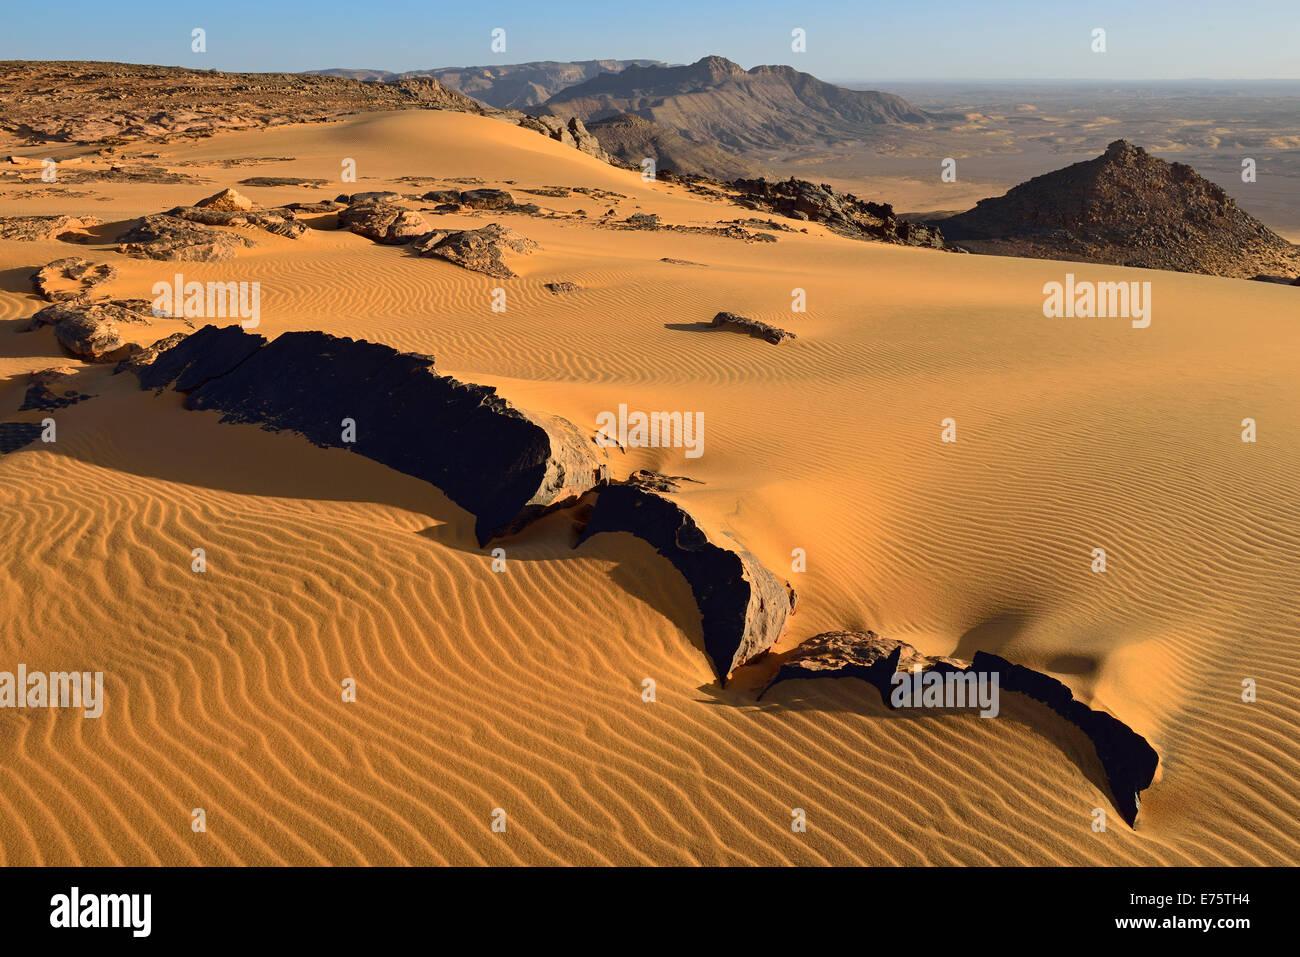 Western escarpment of Tadrart plateau, Tassili n'Ajjer National Park, Unesco World Heritage Site, Algeria, Sahara - Stock Image